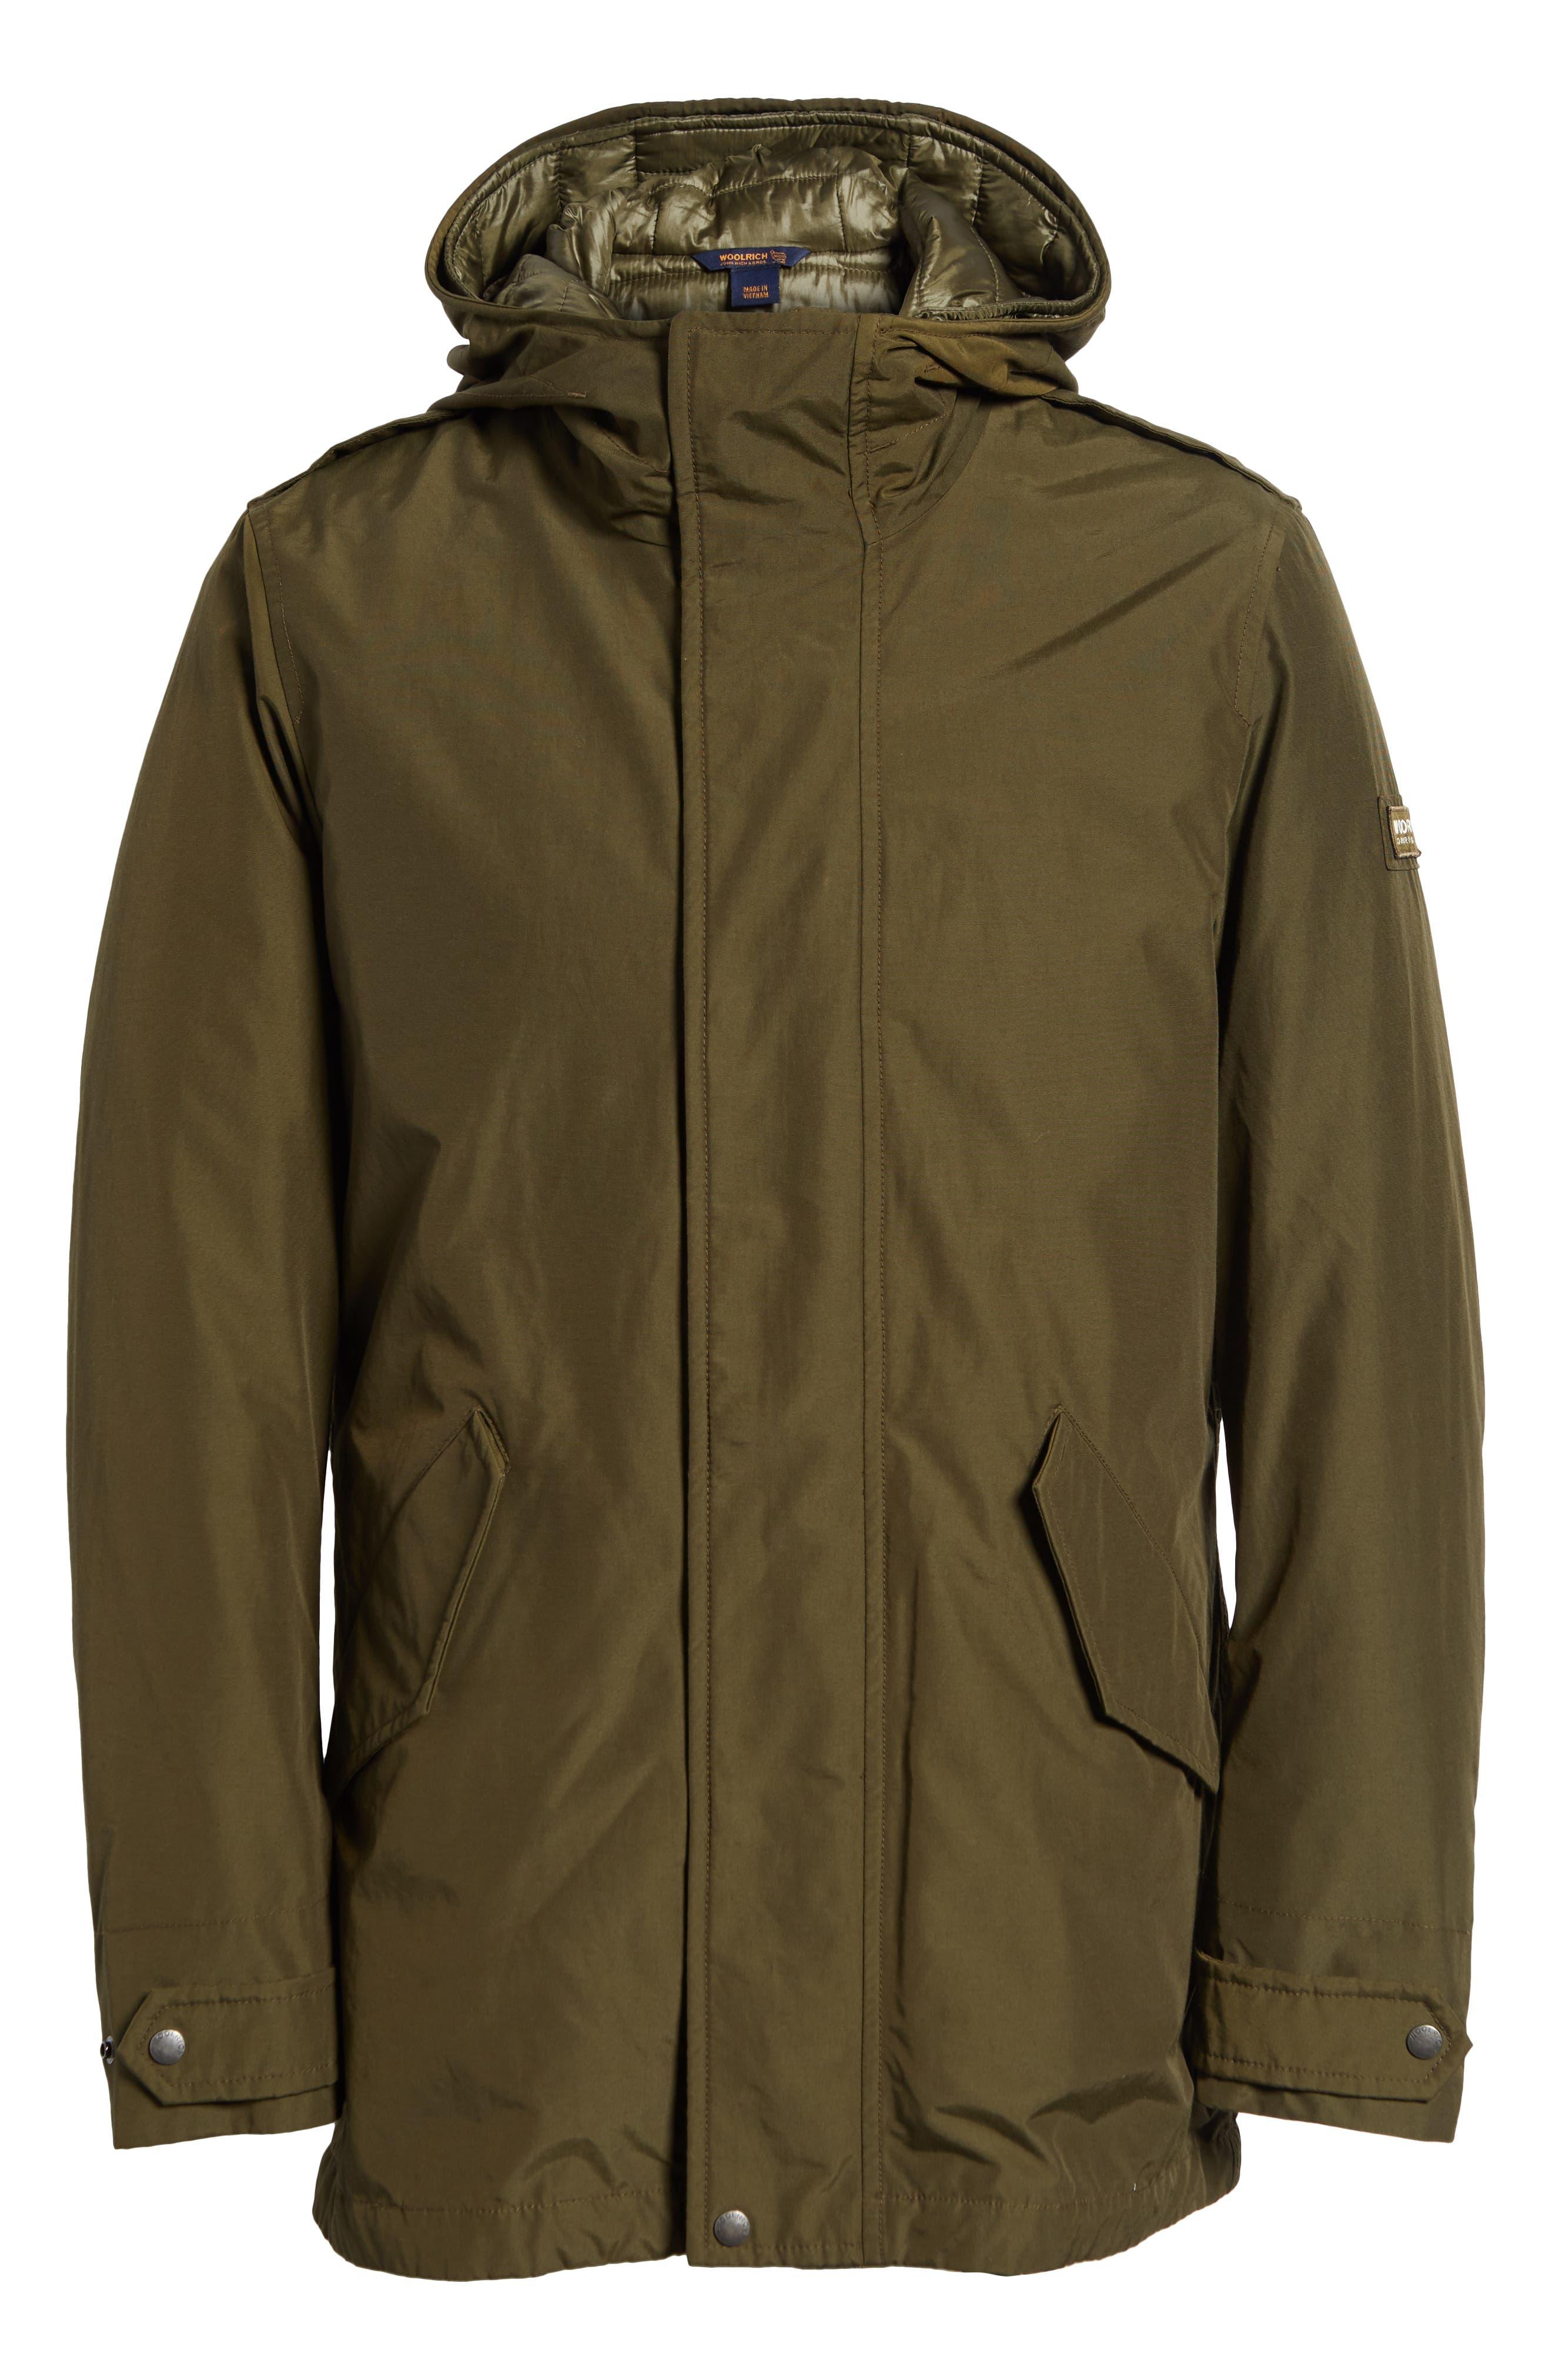 John Rich 'Long Military Eskimo' 3-in-1 Hooded Jacket,                             Alternate thumbnail 6, color,                             FLINT OLIVE